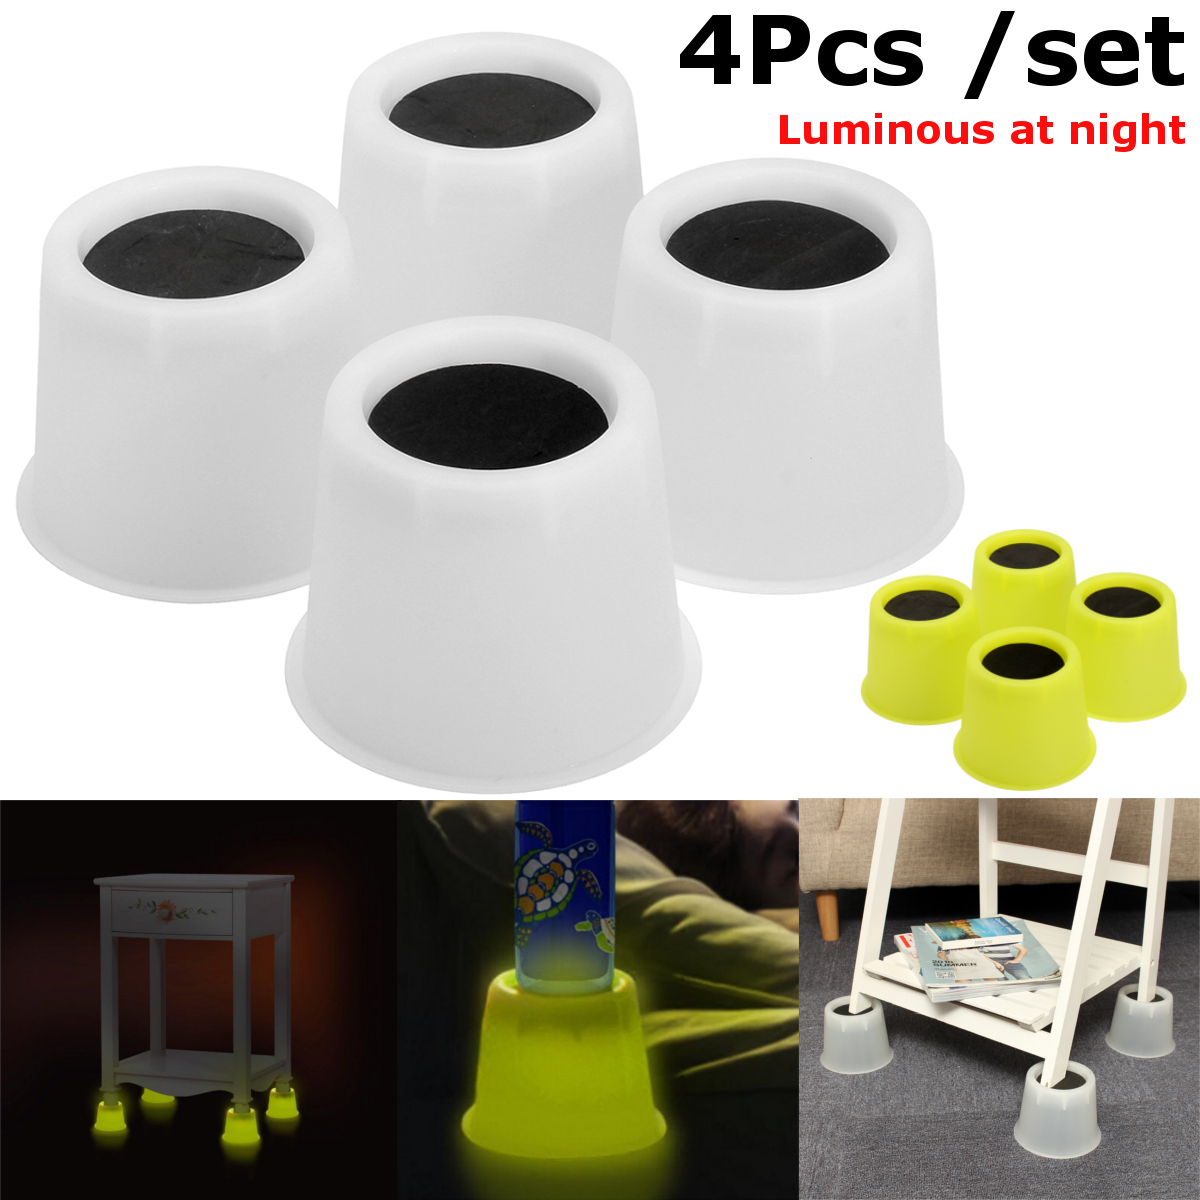 4Pcs Luminous PP Bed Furniture Chair Riser Booster Furniture Lifter Wardrobe Riser Elephant Feet Aids Luminous Set